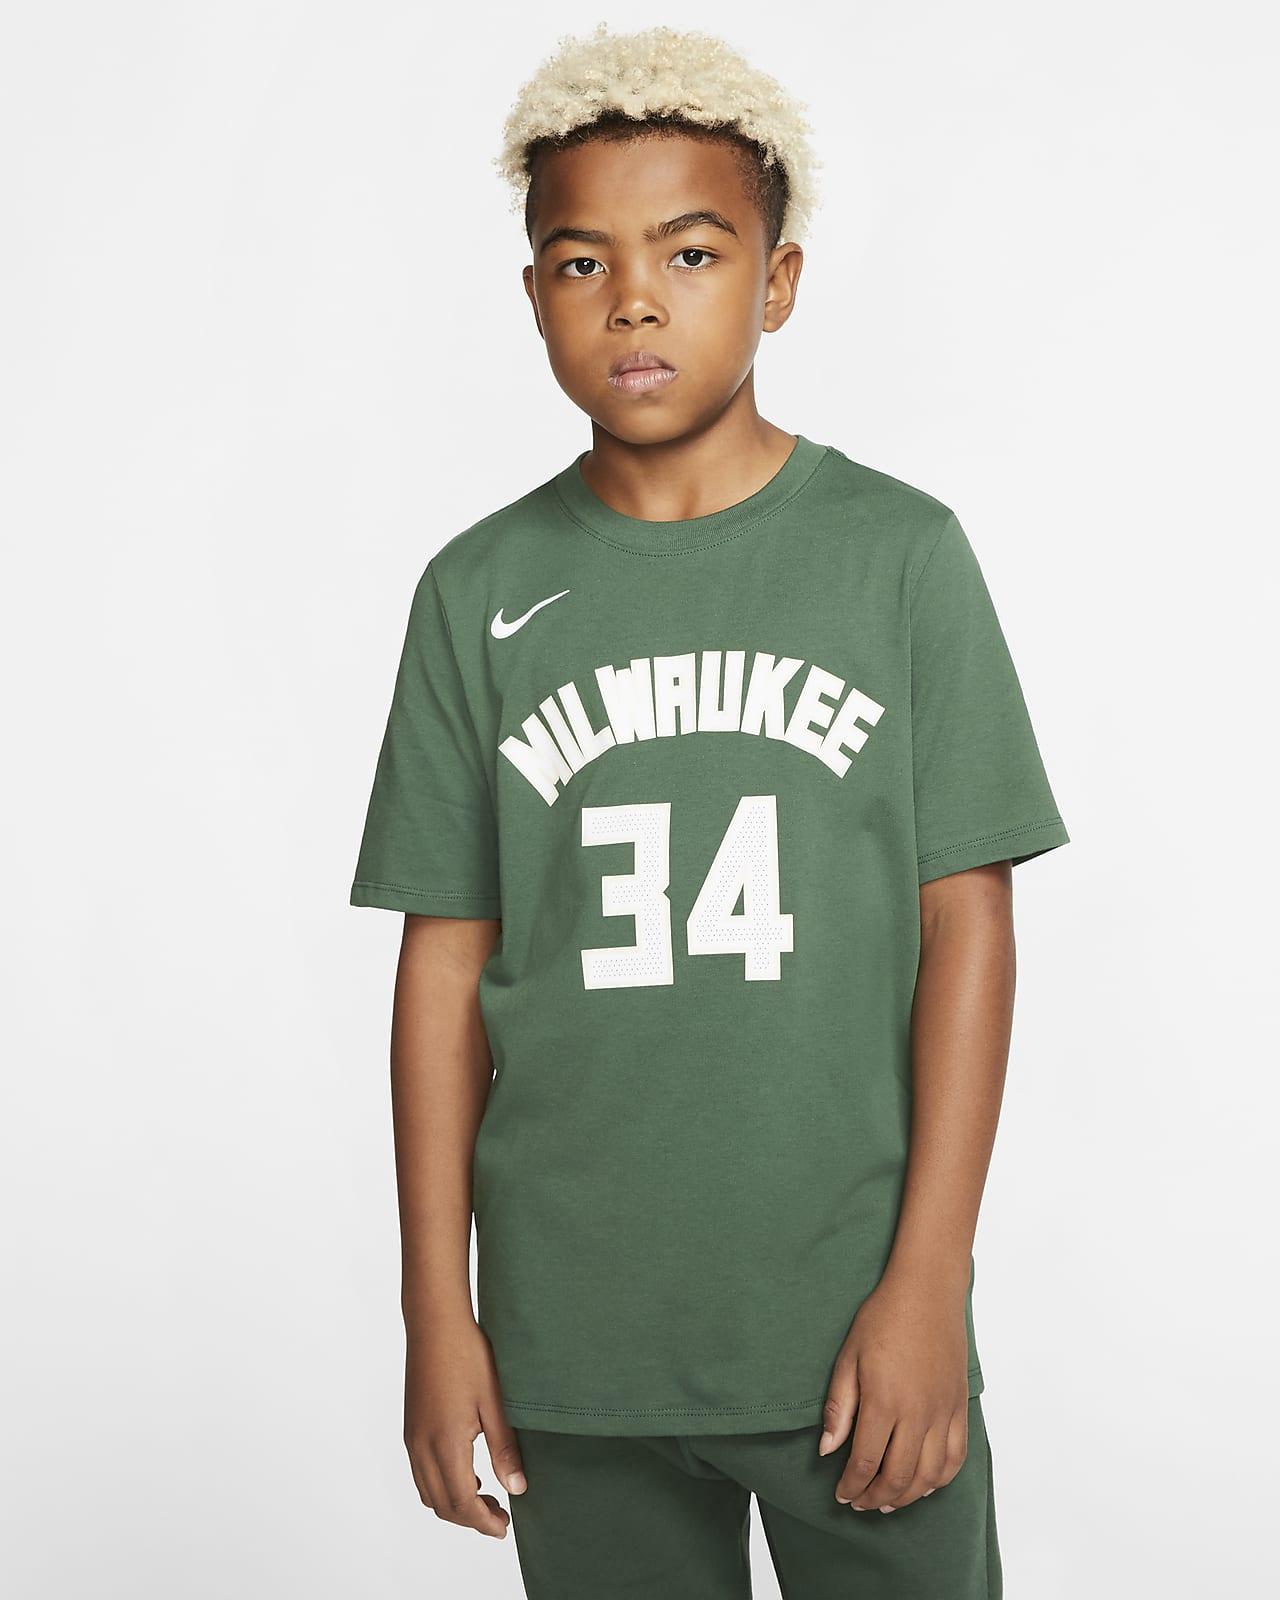 horizonte Leer Perspectiva  Nike Icon NBA Bucks (Antetokounmpo) Camiseta de baloncesto - Niño. Nike ES